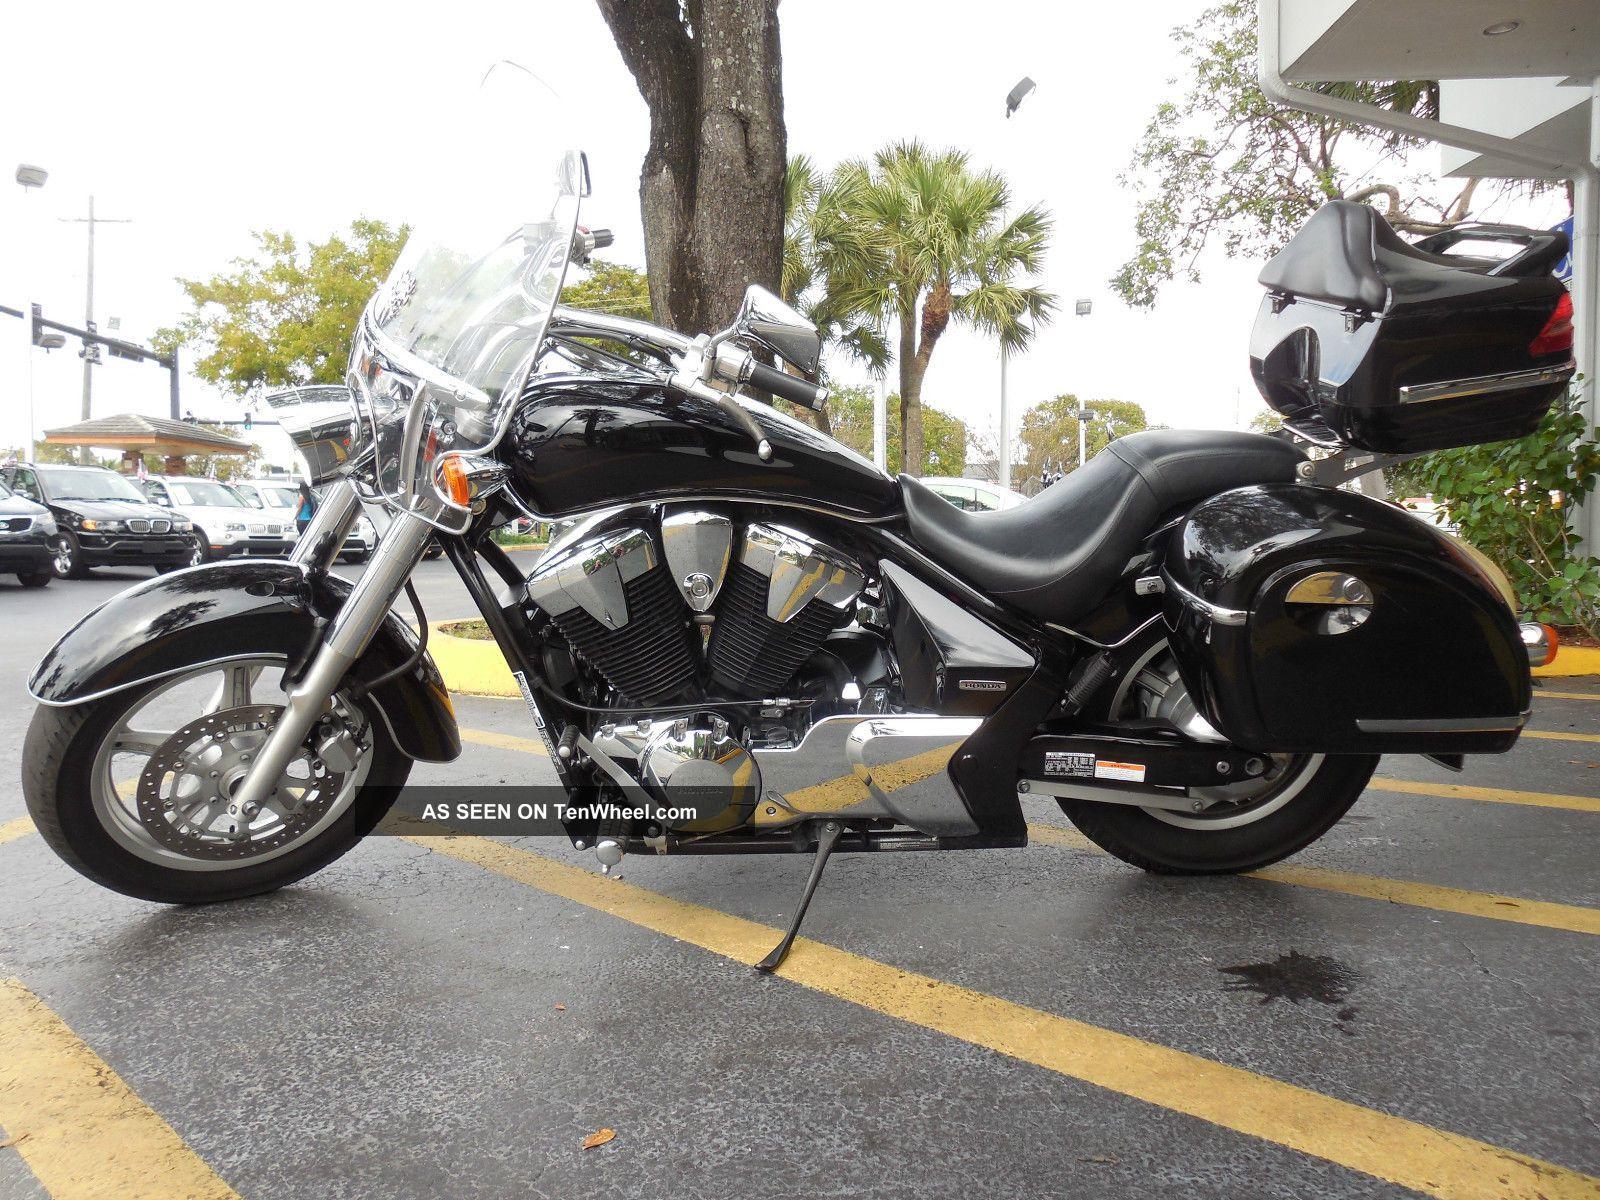 2011 Honda Interstate 1300 Tour Bags Large Windshield